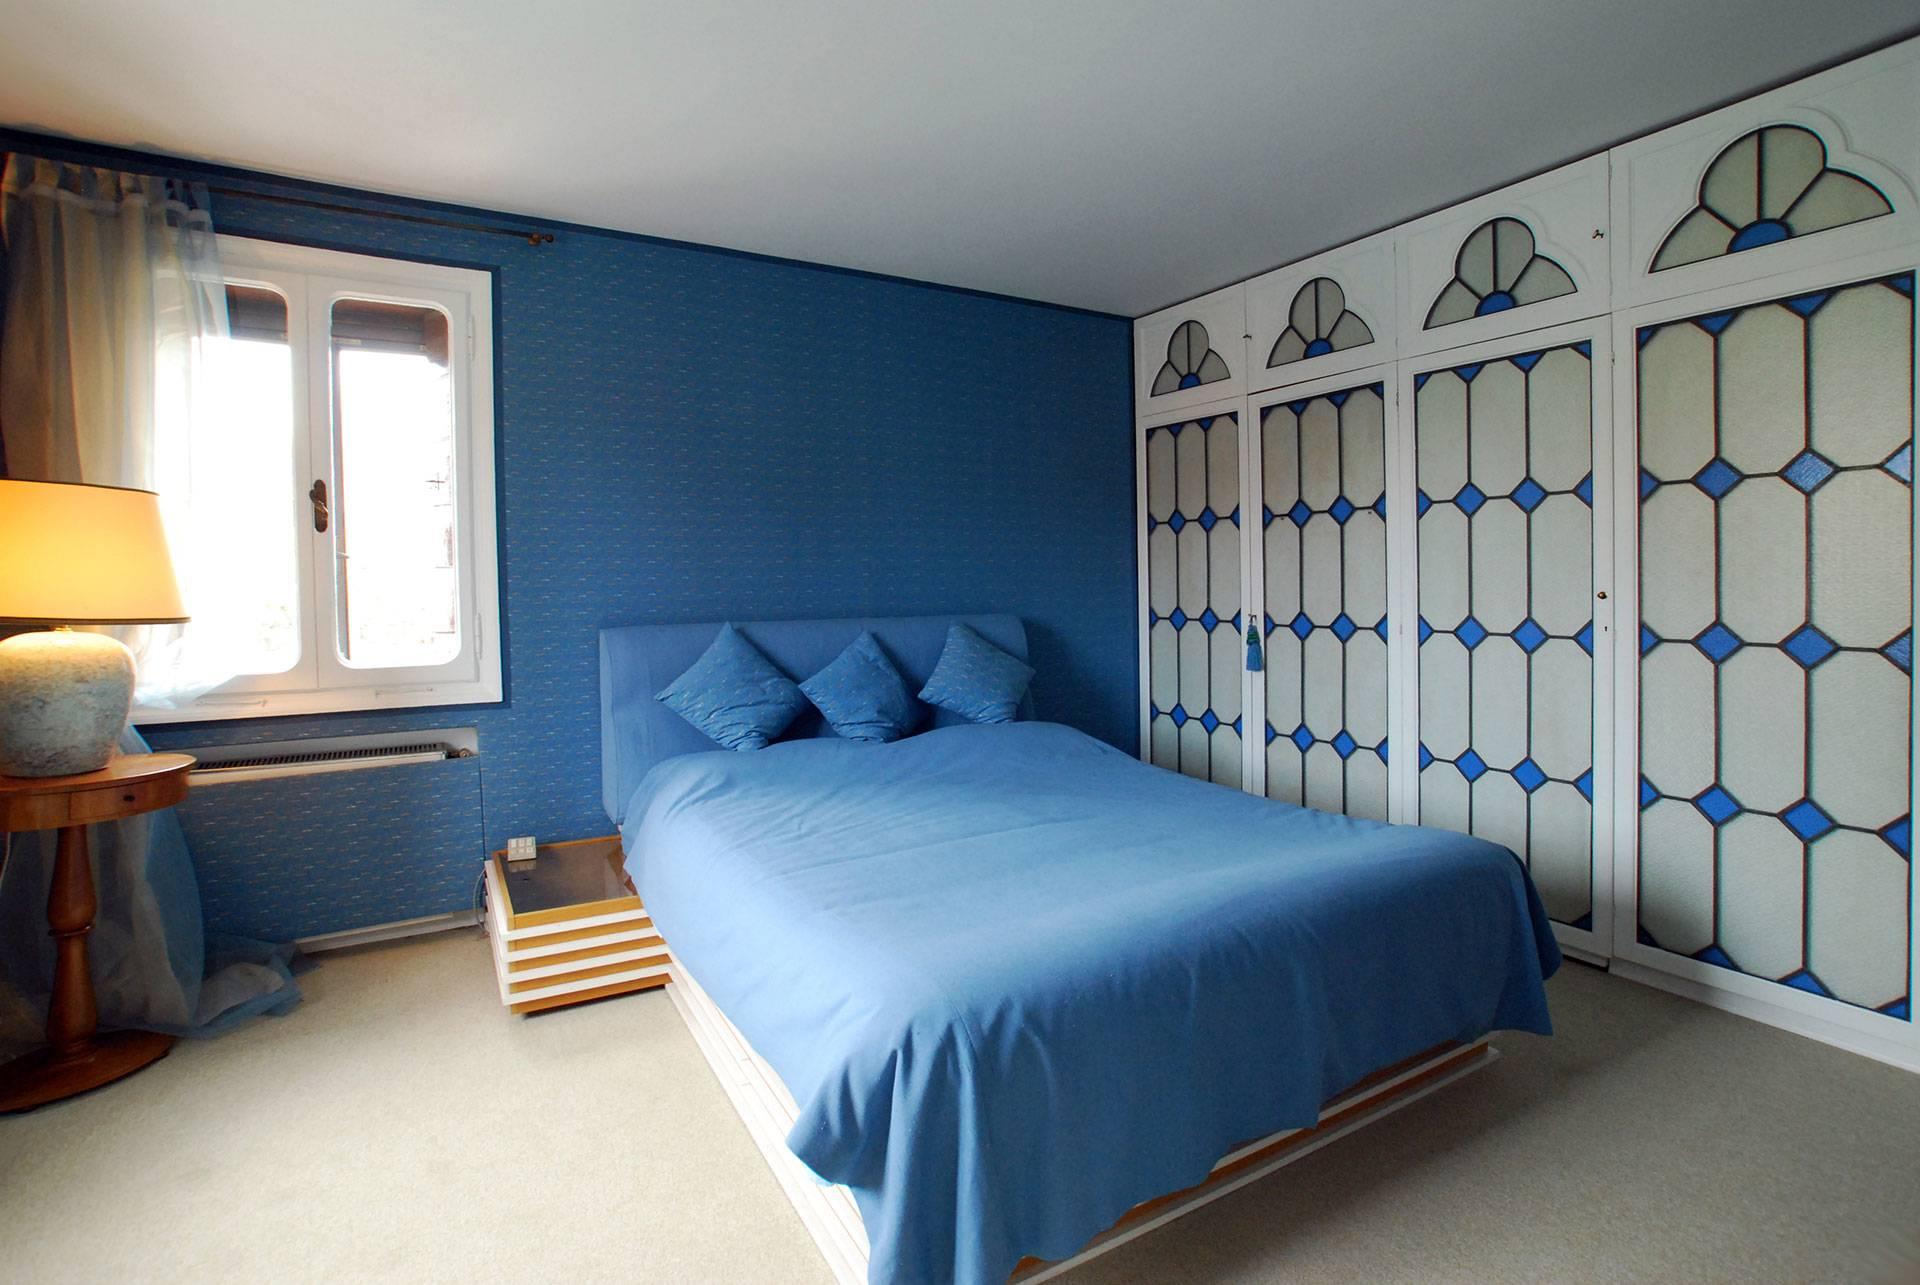 master bedroom wth en-suite bathroom